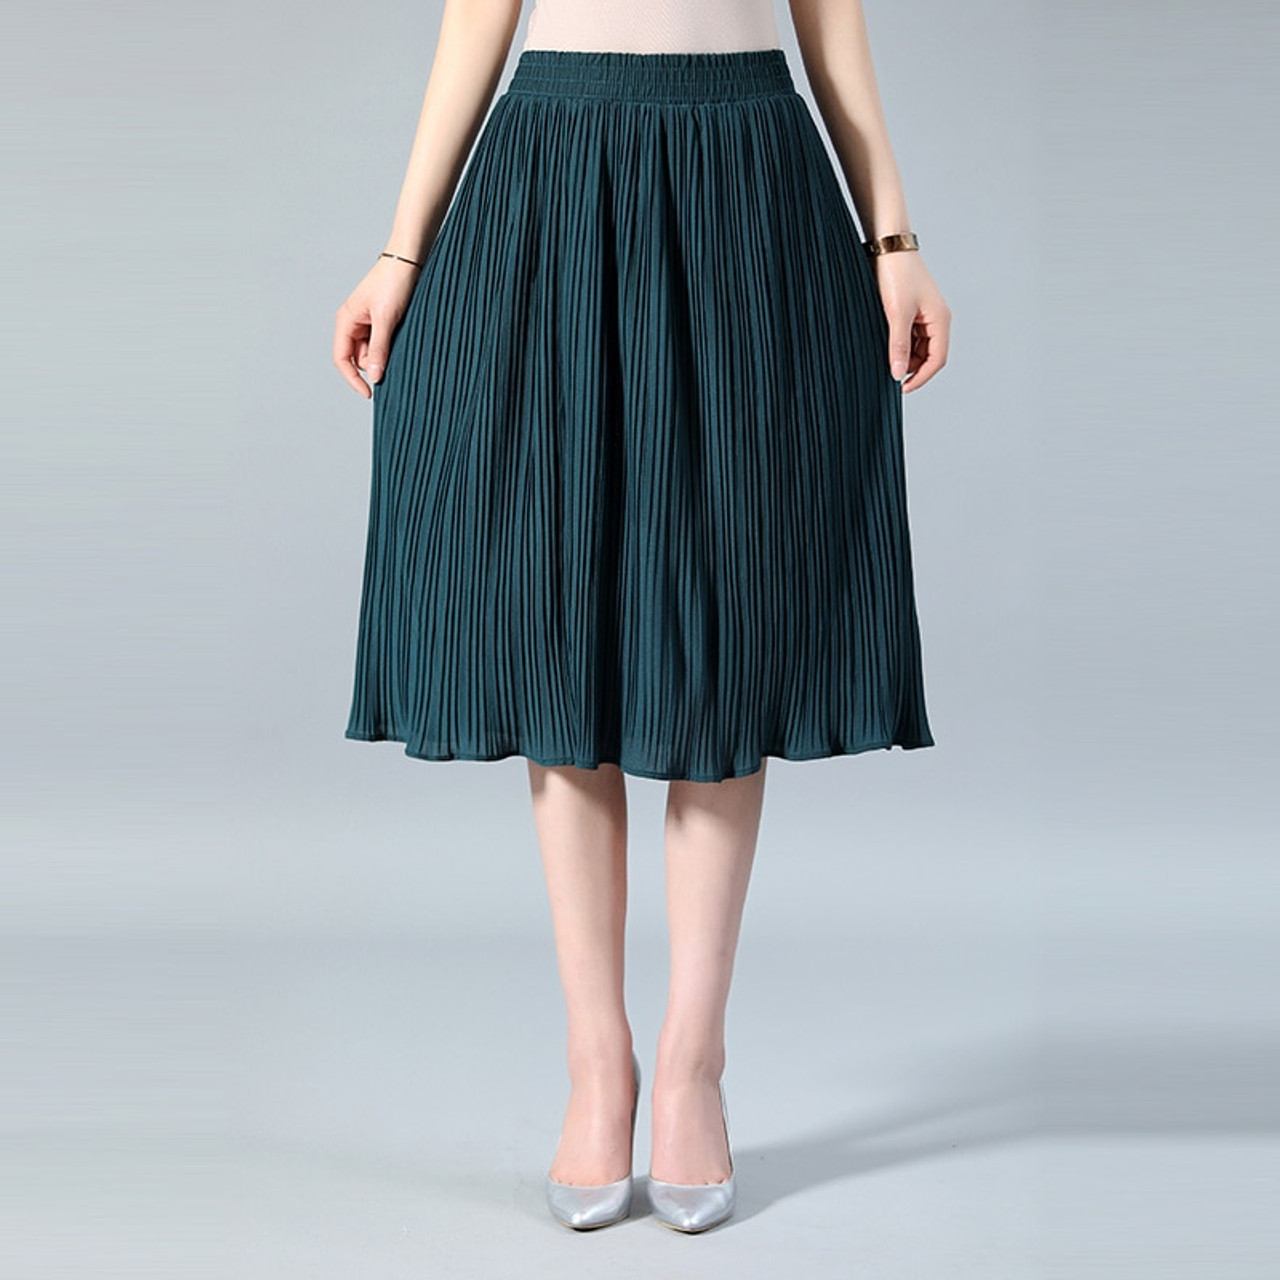 mejor selección 3b23b f0dc6 SNOW PINNACLE Women Chiffon Skirt Summer Thin Solid Pleated Skirts Womens  Saias Midi Faldas Vintage Women Midi Skirt